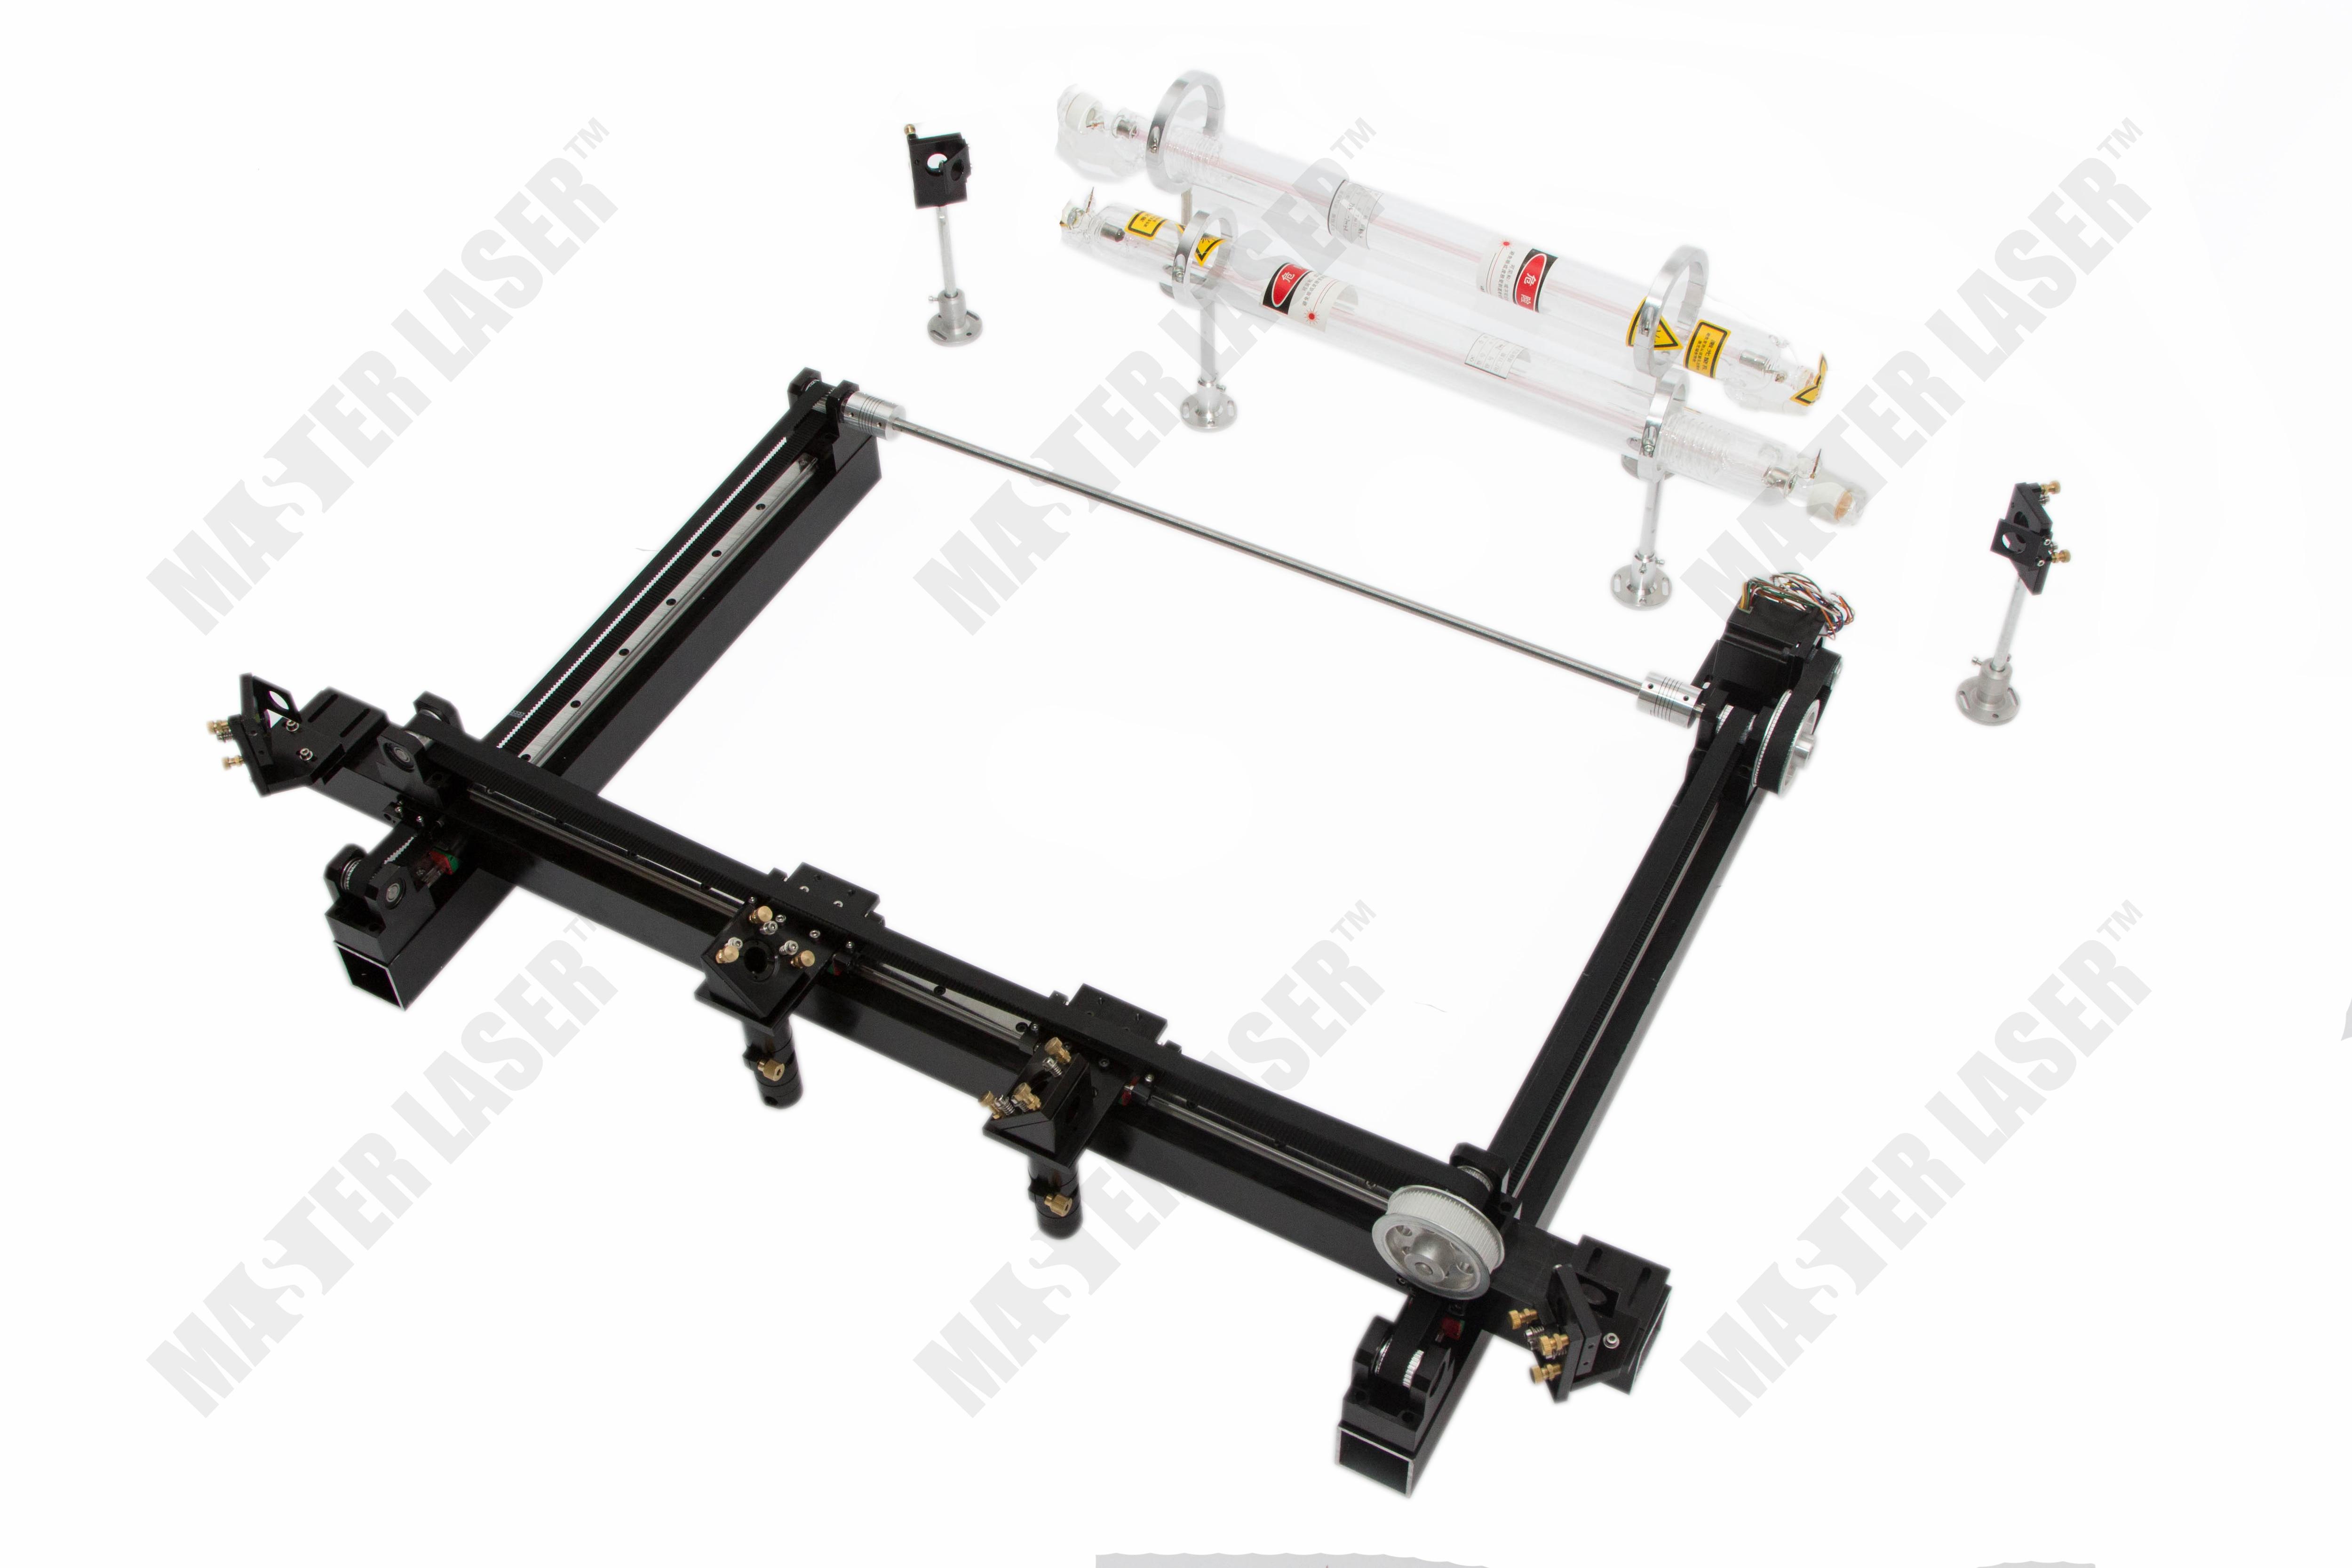 цена Best Quality Work Table 100*80 CO2 Laser Cutting Machine for Wood Crafts Mirror Mount 2 Laser Heads онлайн в 2017 году